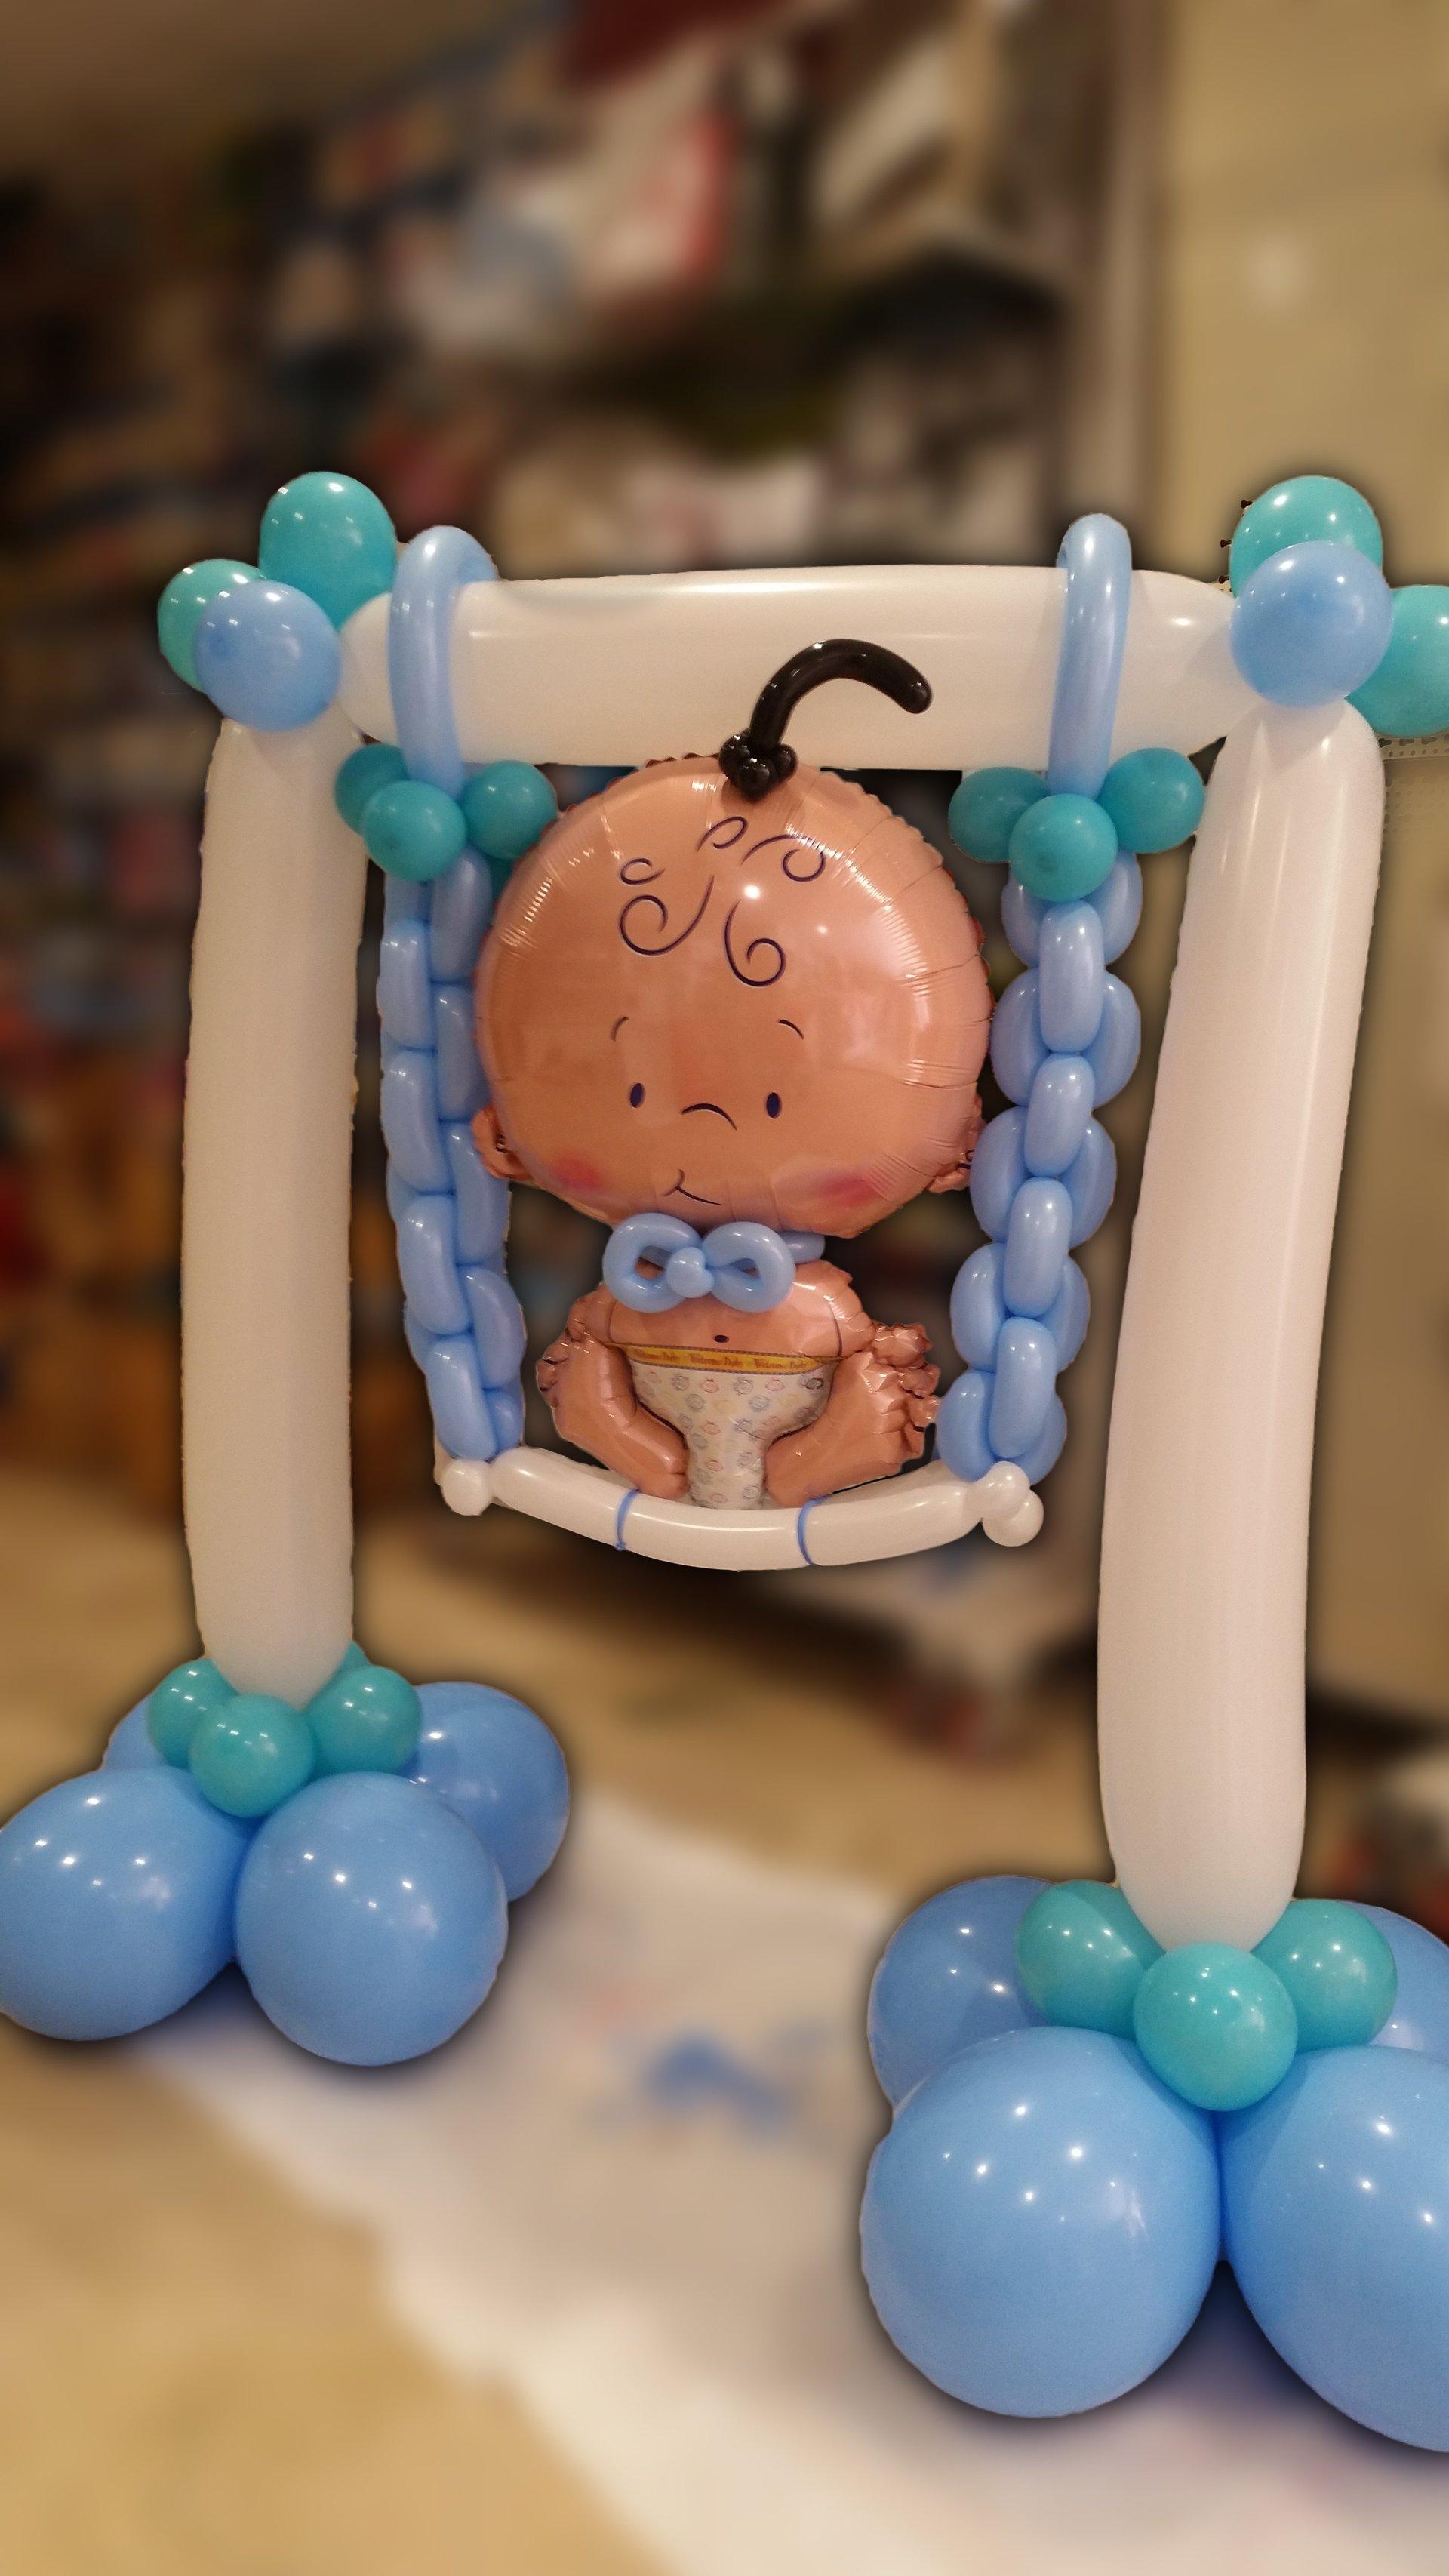 nascita-palloncini-altalena-bimbo-maschietto-azzurro